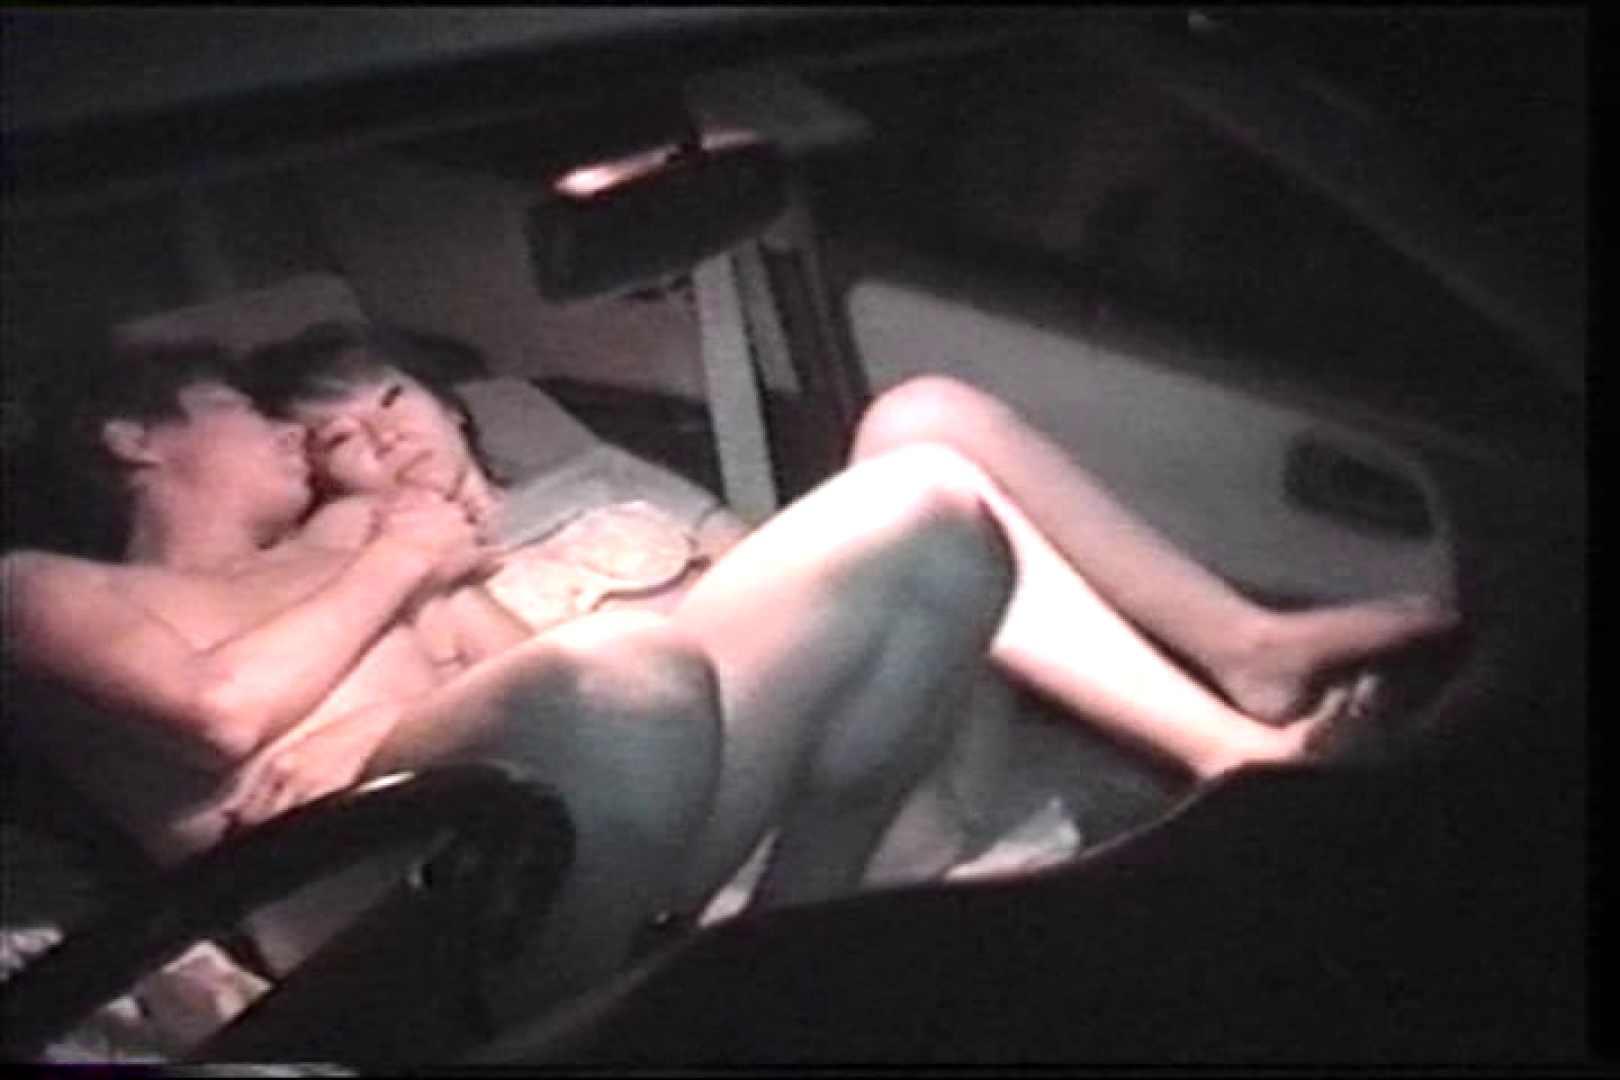 MASAさんの待ち伏せ撮り! 赤外線カーセックスVol.2 カーセックス すけべAV動画紹介 72画像 69